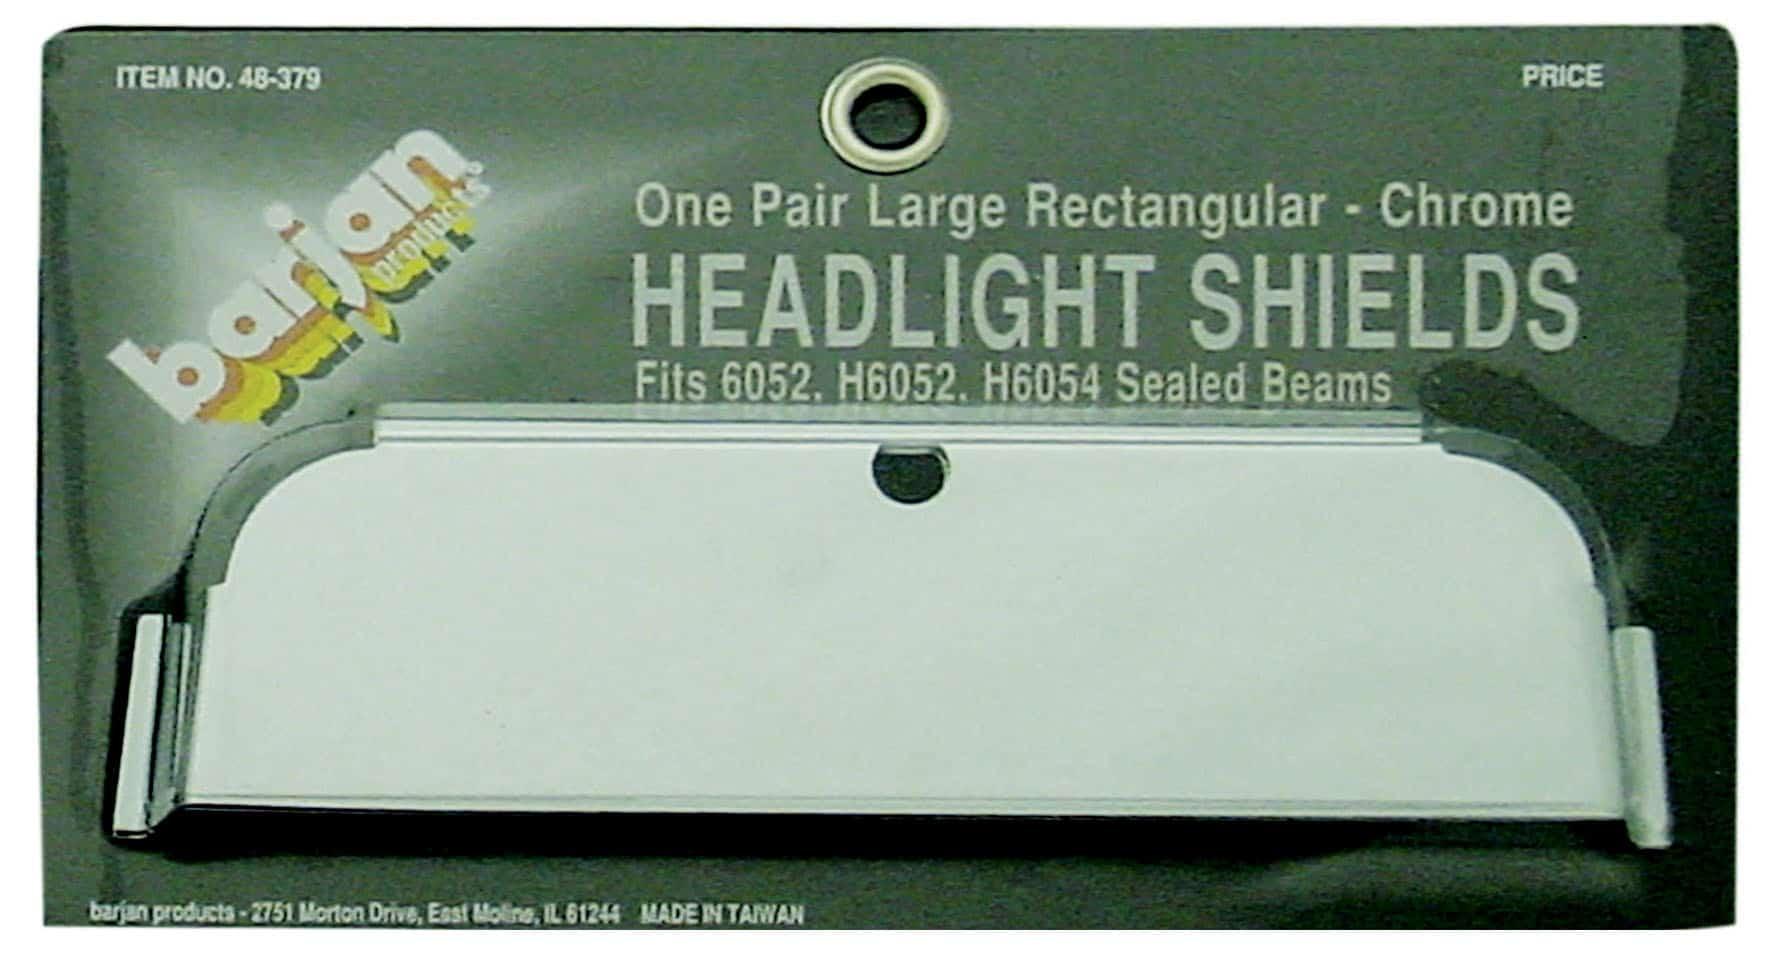 048379 - Large Rectangular Chrome Headlight Shields (Pair)